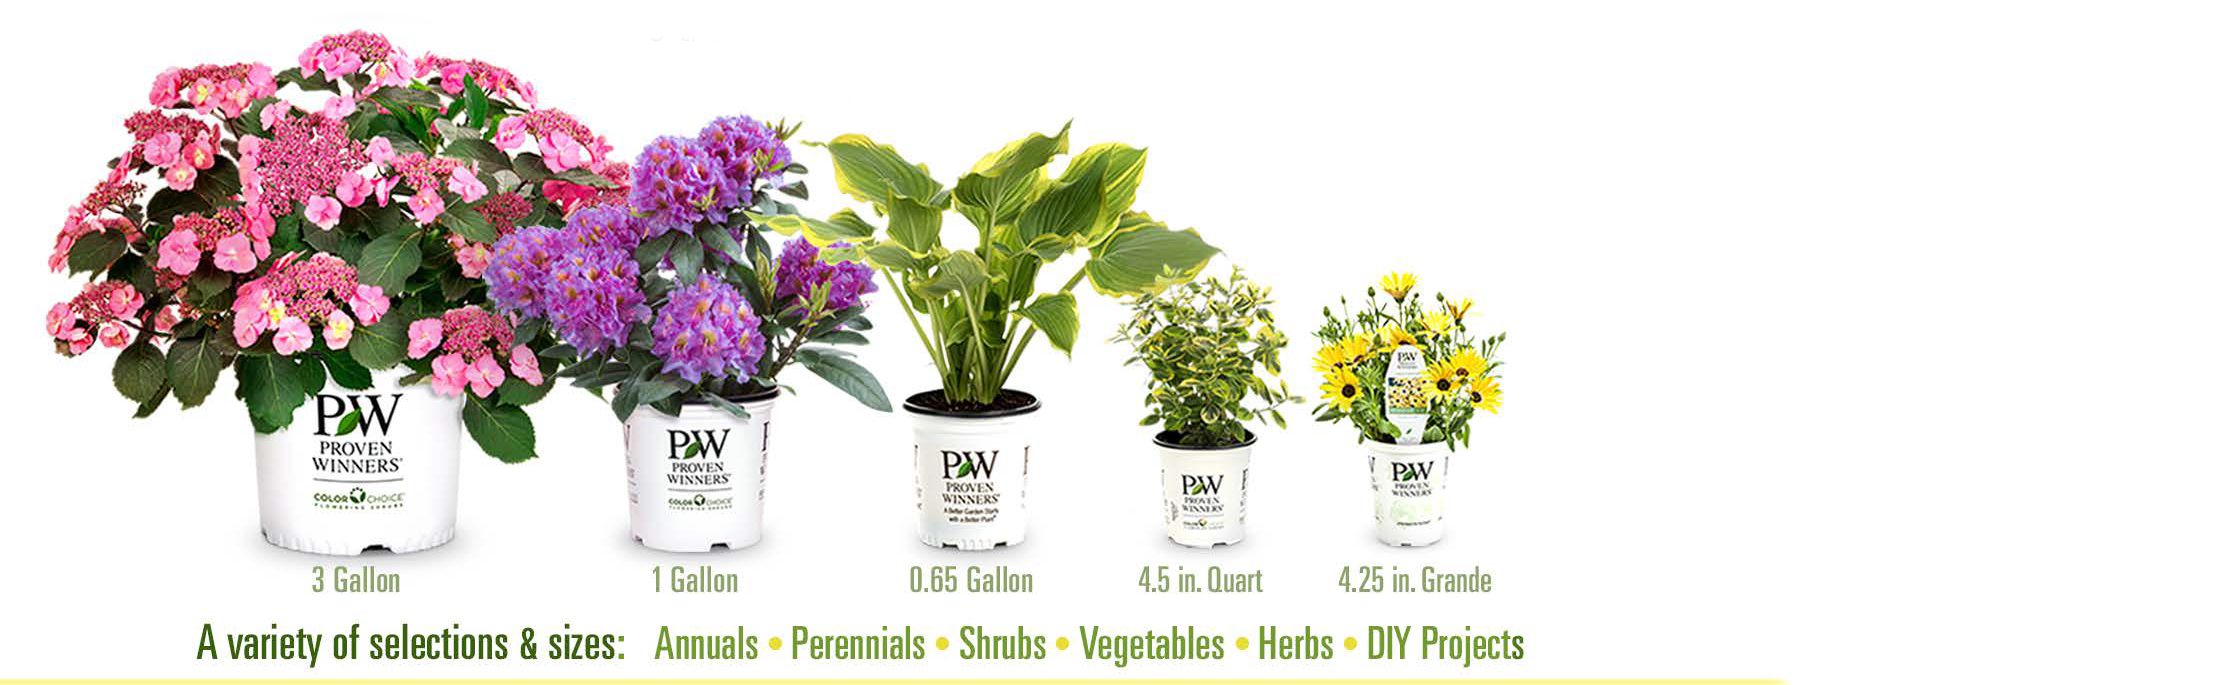 Amazoncom endless summer hydrangea plants